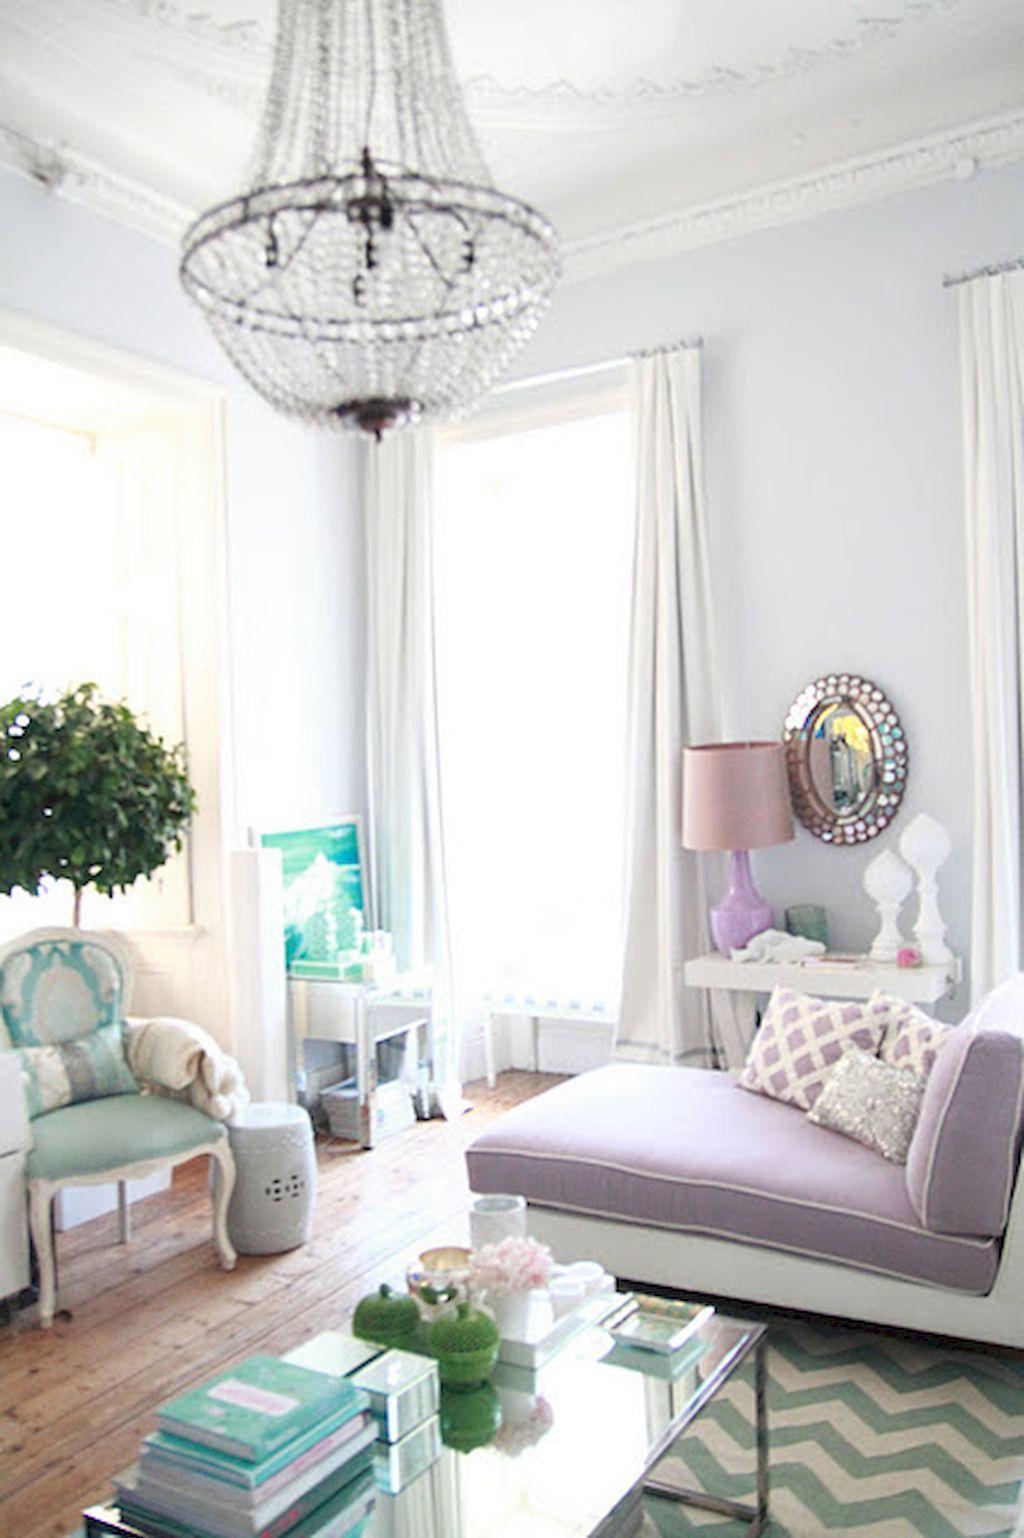 95 graceful feminine living rooms ideas, decor, design trends